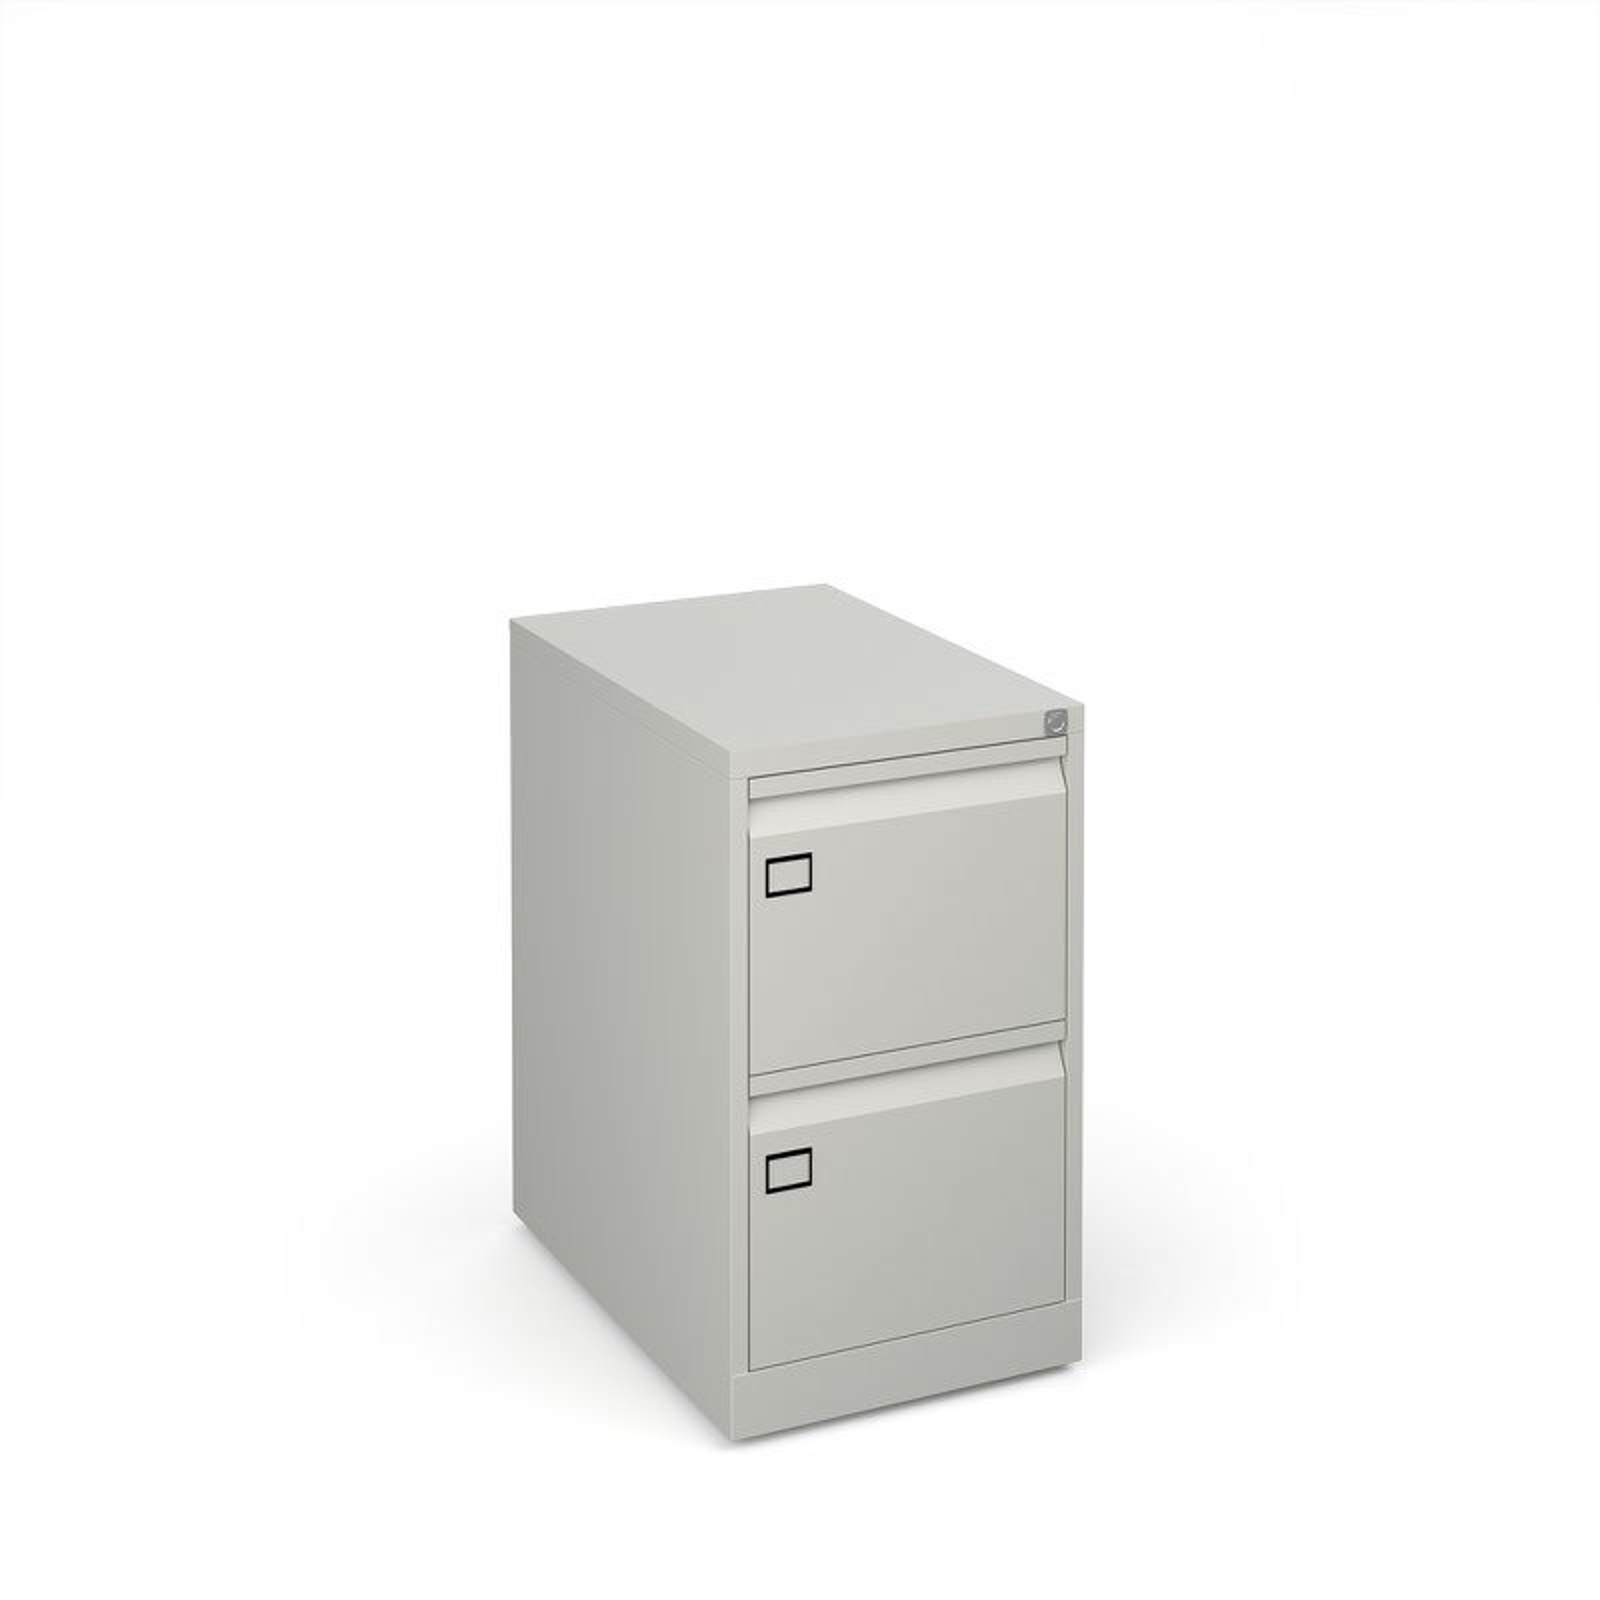 Steel 2 drawer filing cabinet 711mm high - goose grey